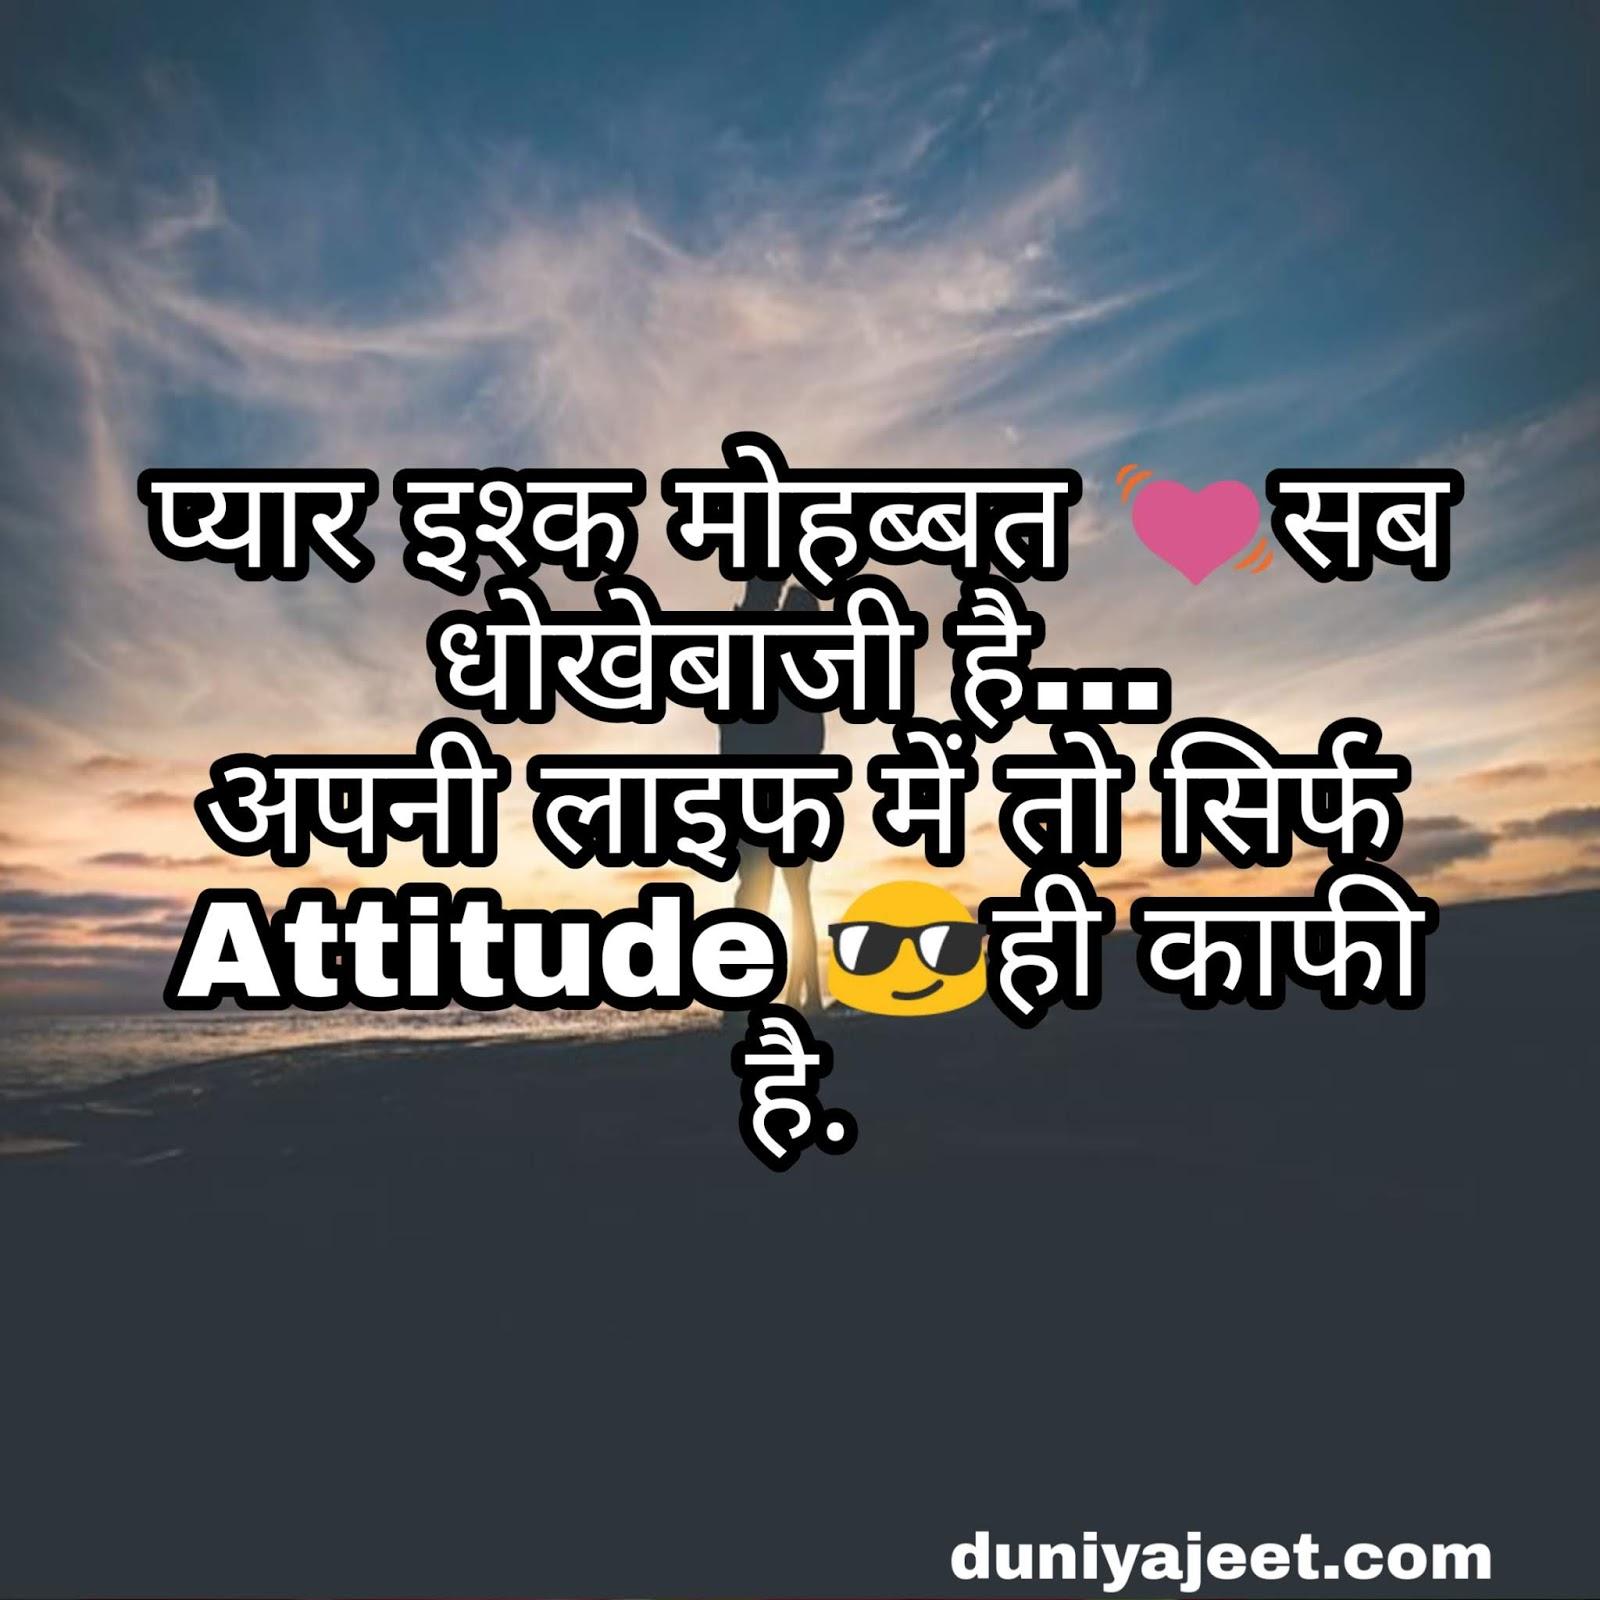 Best New Fb Attitude Status Fb Status Hindi - Duniyajeet.com